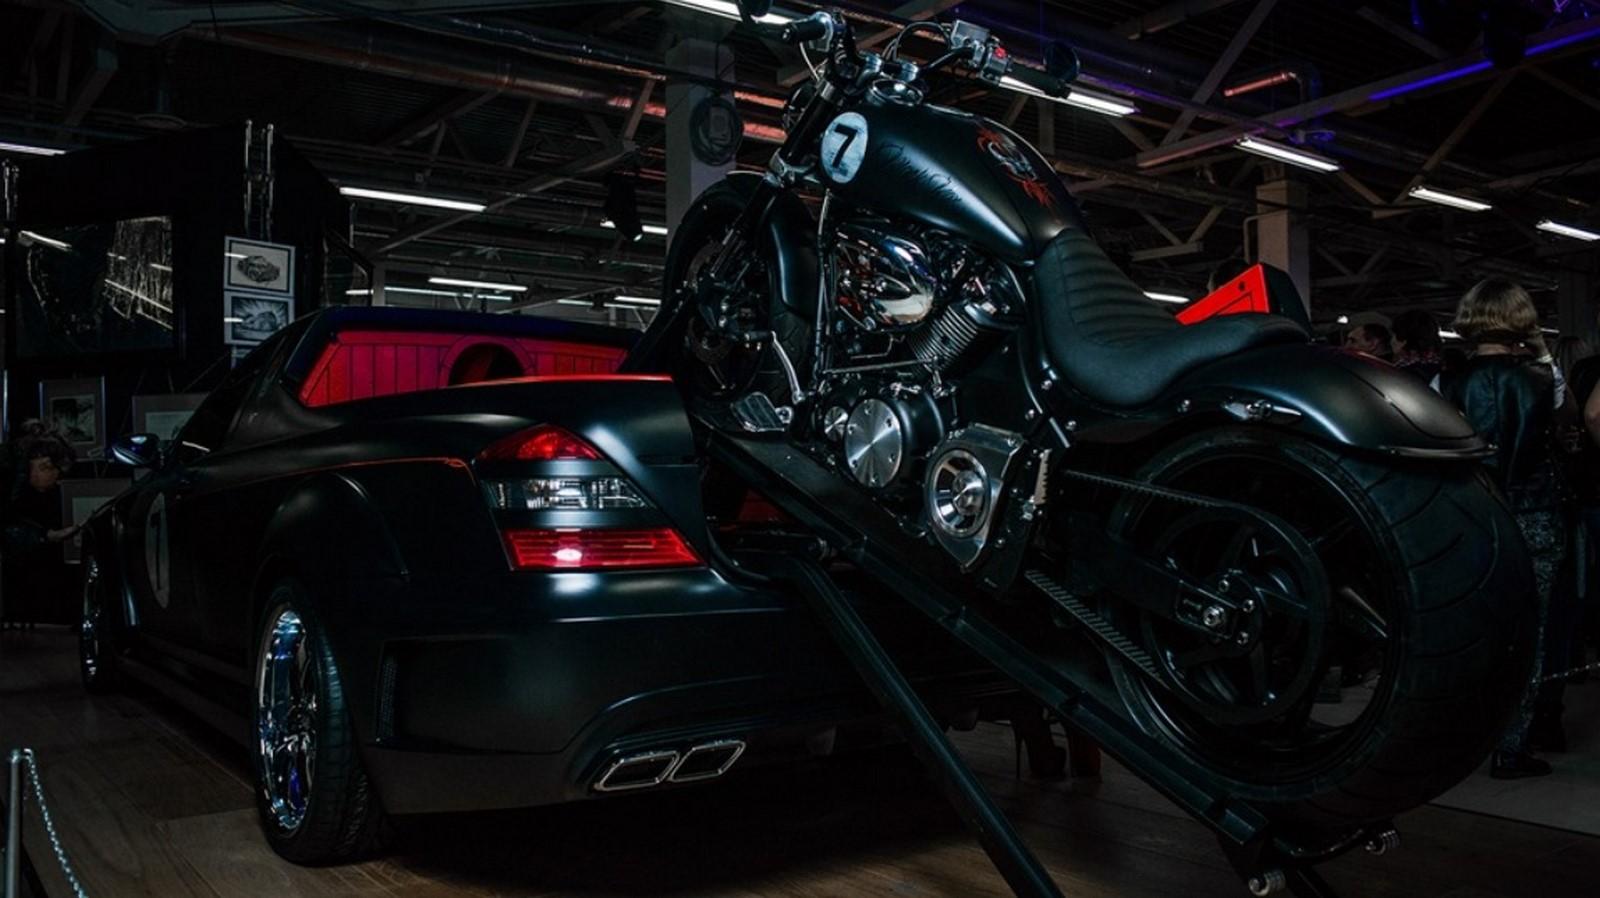 mercedes-benz-s-class-black-kox-pickup-19